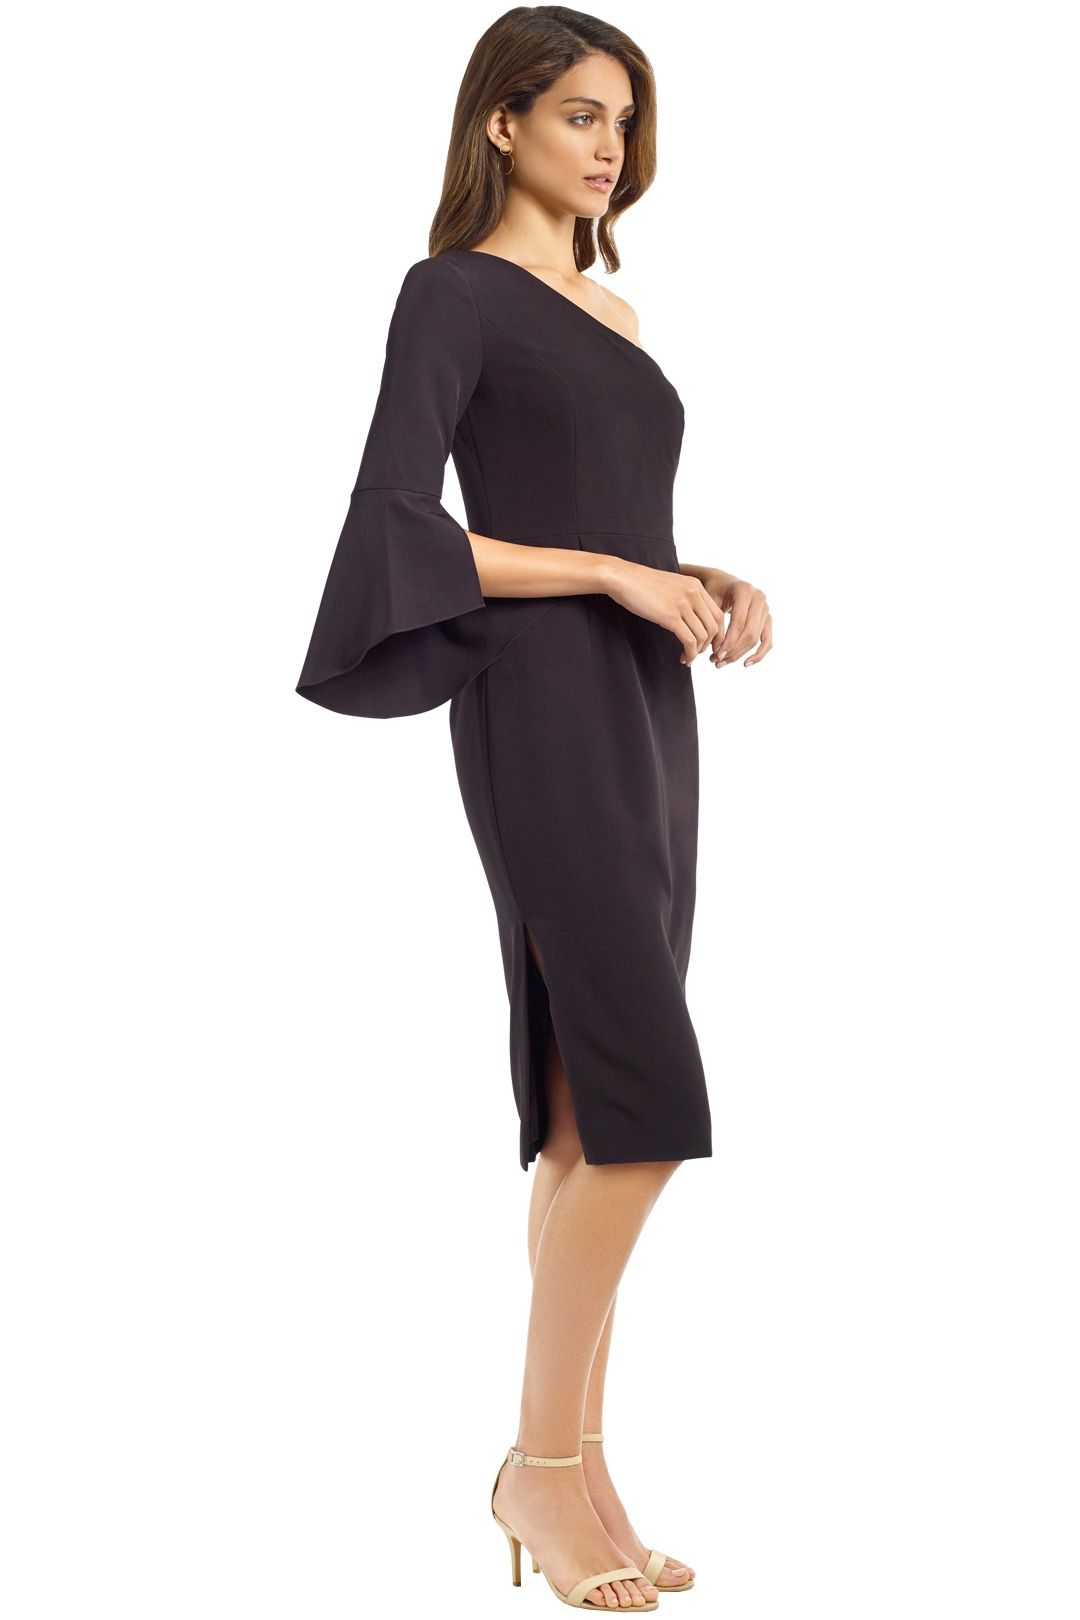 Milly - Sadrine Dress - Black - Side